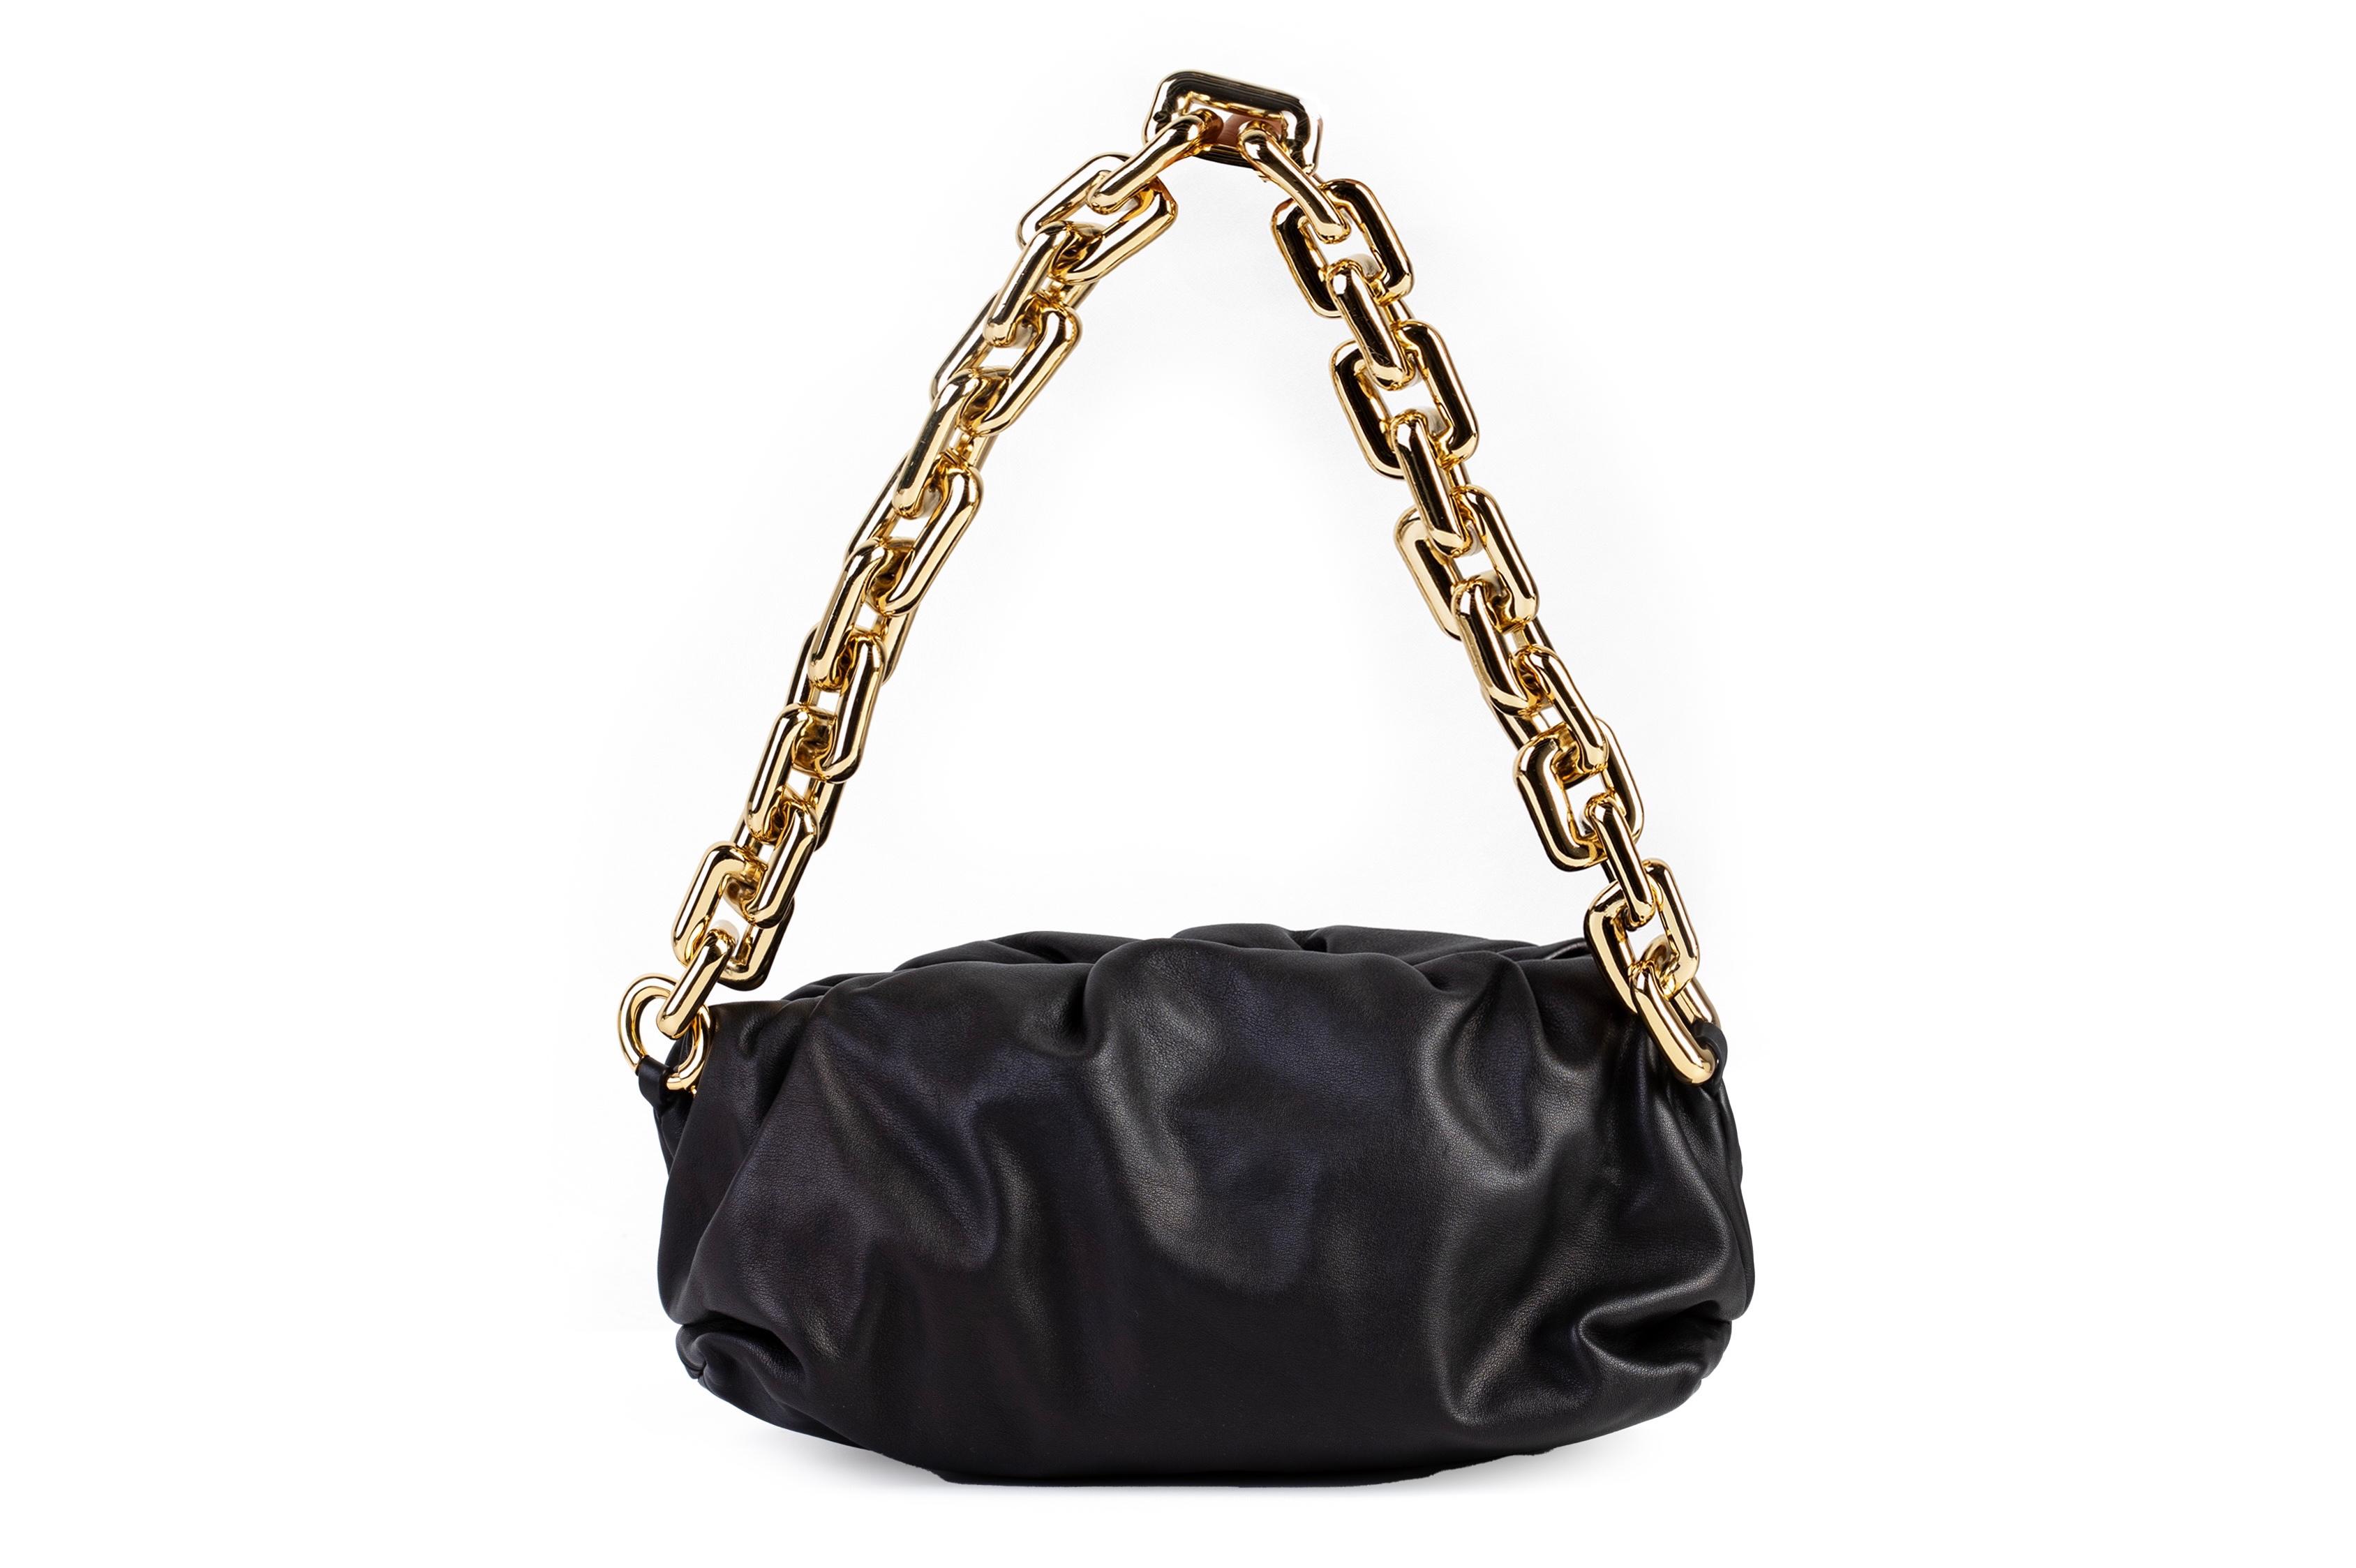 A BOTTEGA VENETA GOLD CHAIN BLACK POUCH SHOULDER BAG